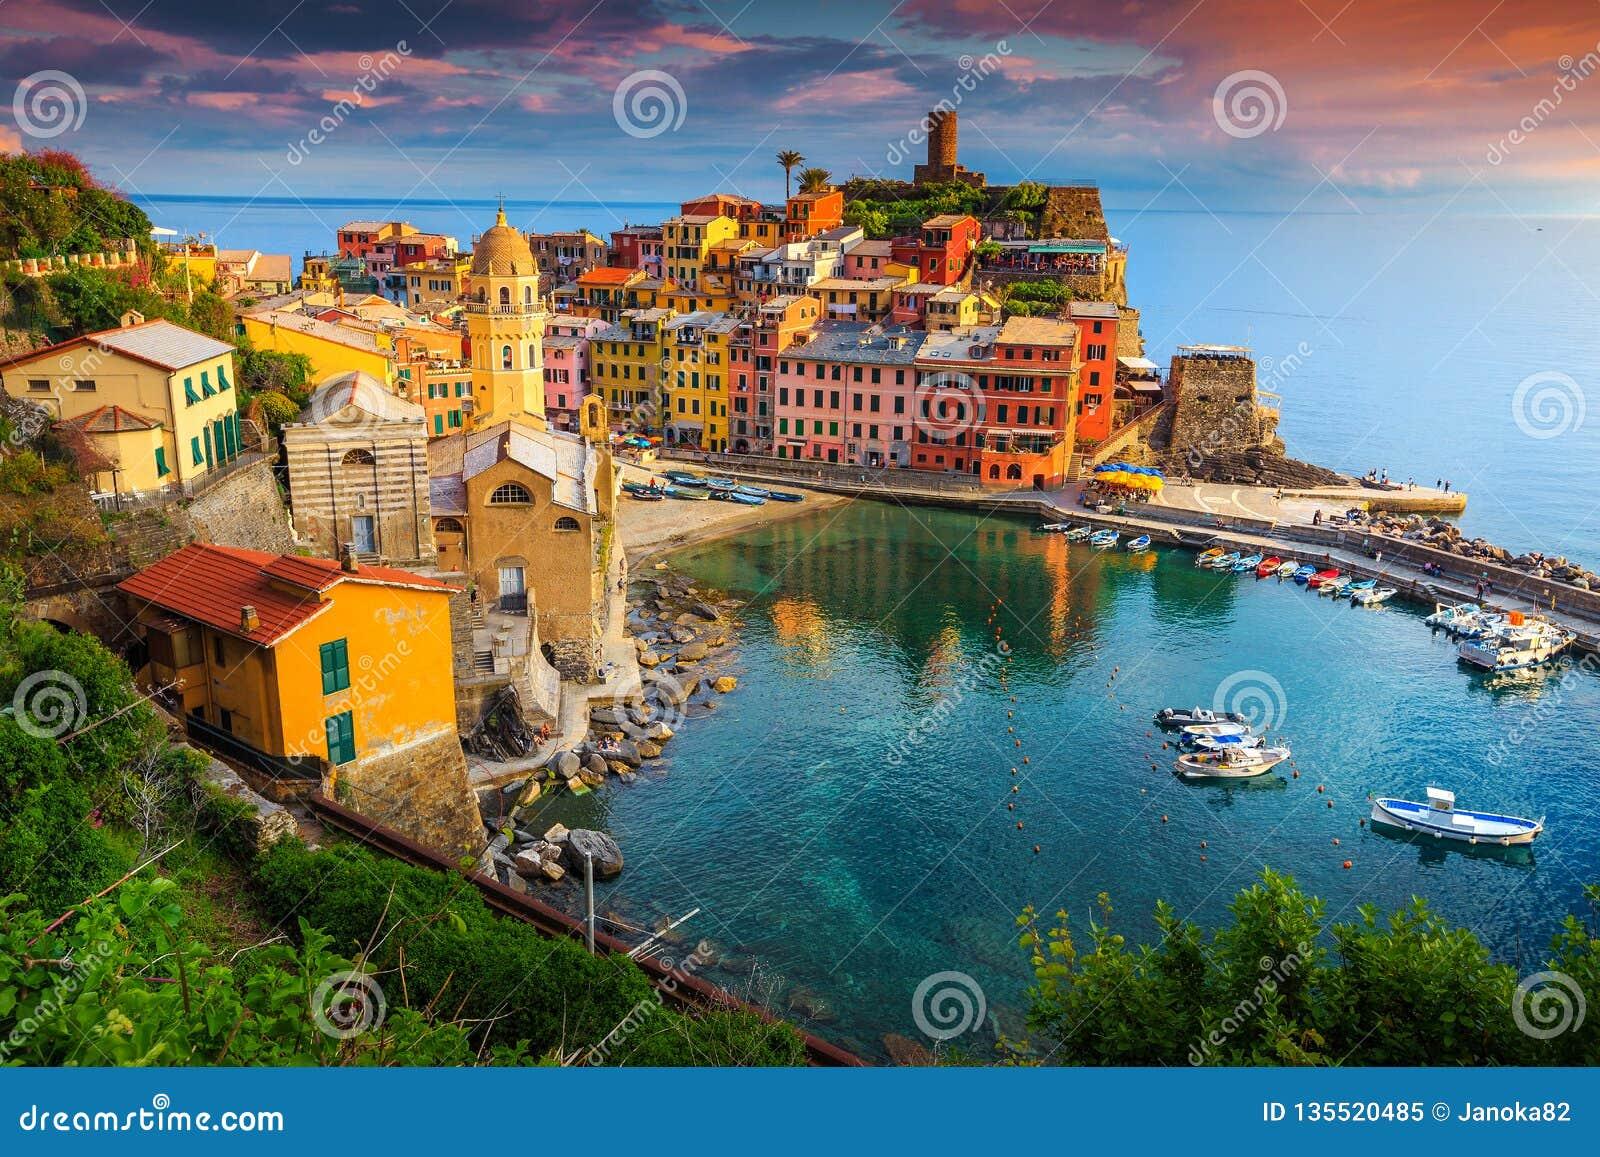 Ursnygg Vernazza by med färgrika hus, Cinque Terre, Italien, Europa